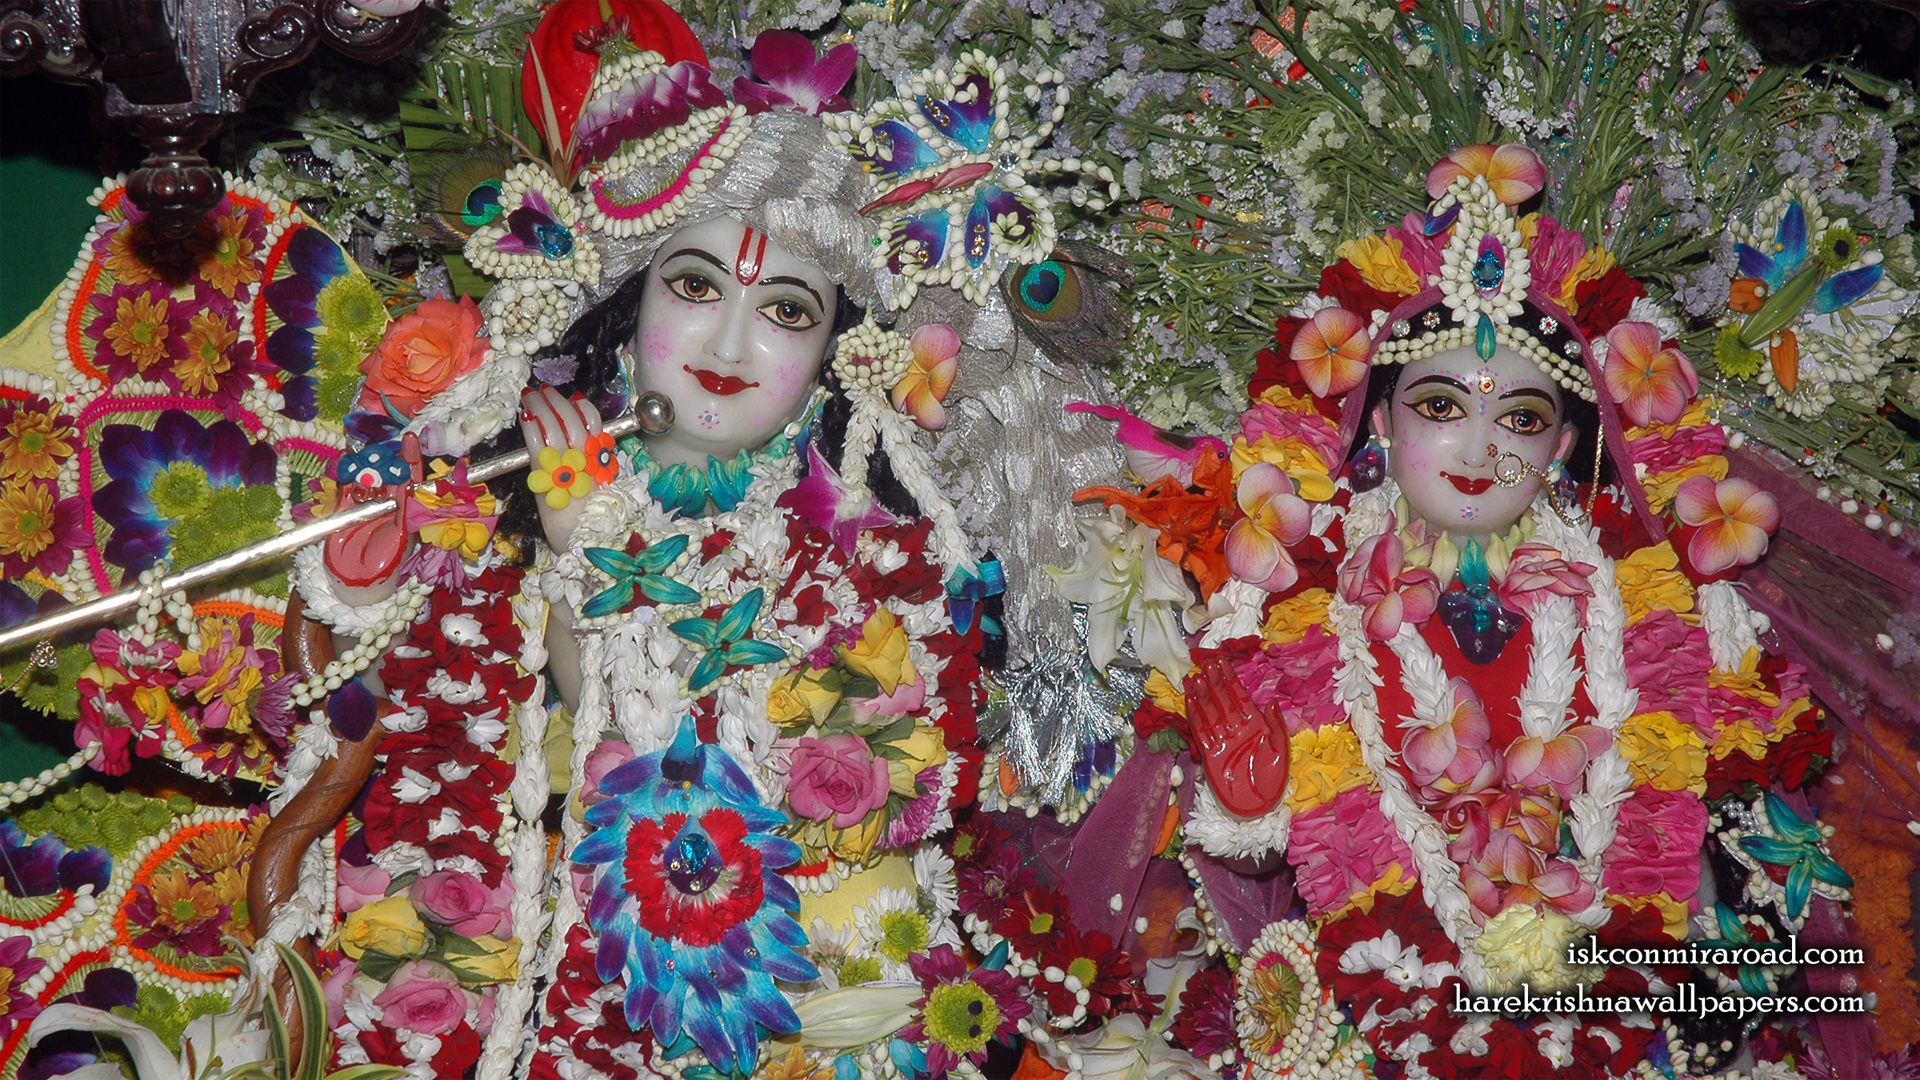 Sri Sri Radha Giridhari Close up Wallpaper (026) Size 1920x1080 Download